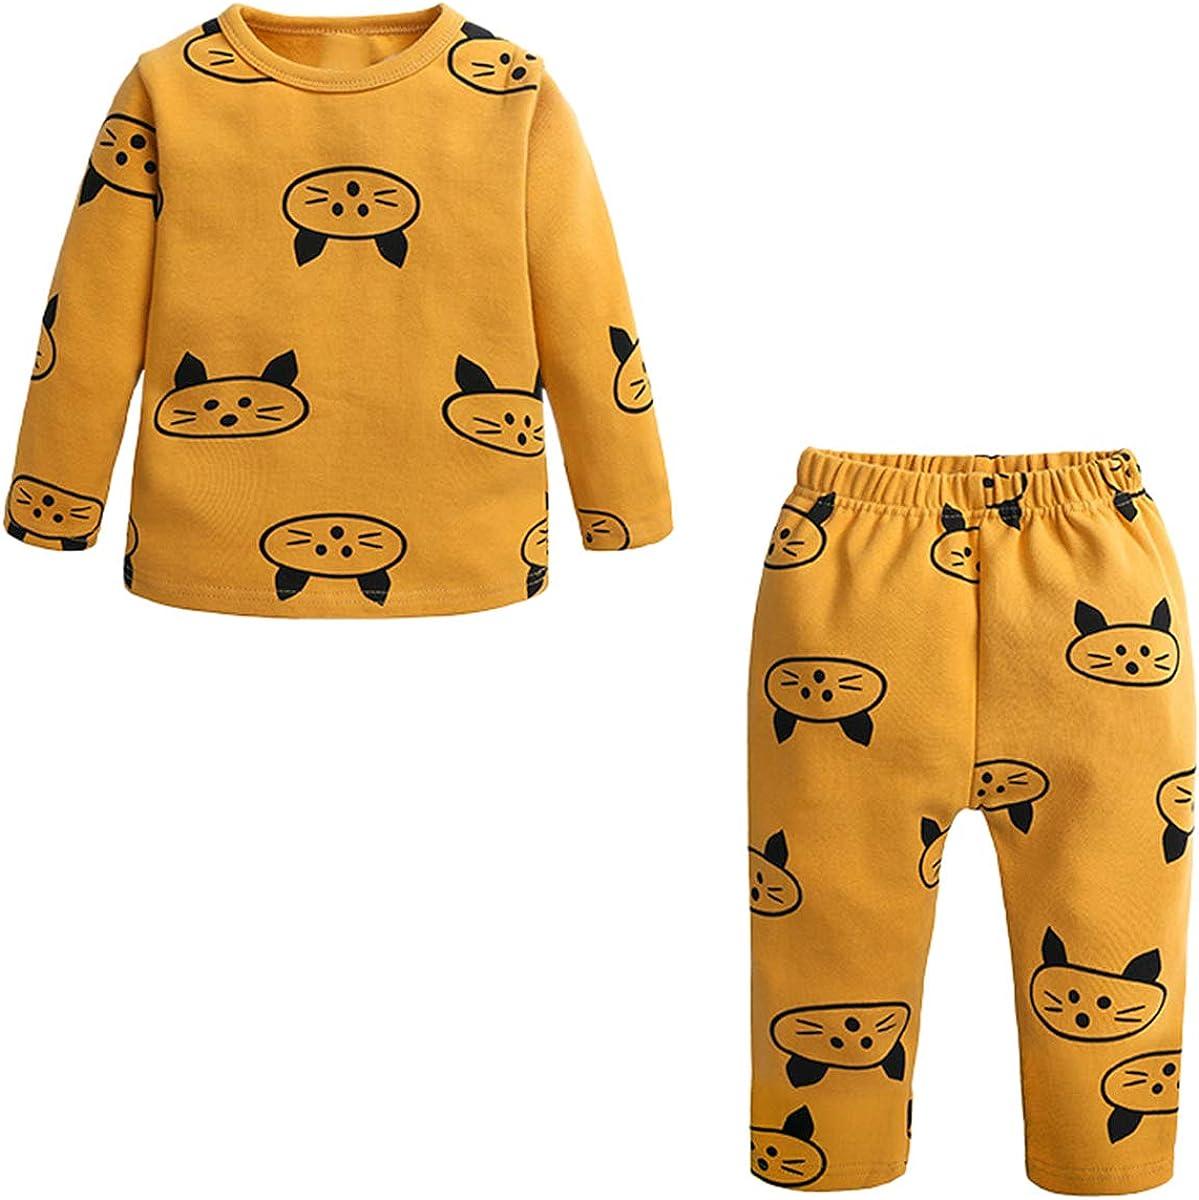 Kids Girl's Thermal Underwear 2 Piece Cat Print Sleepwear Set, Yellow, 4-5T = Tag 130